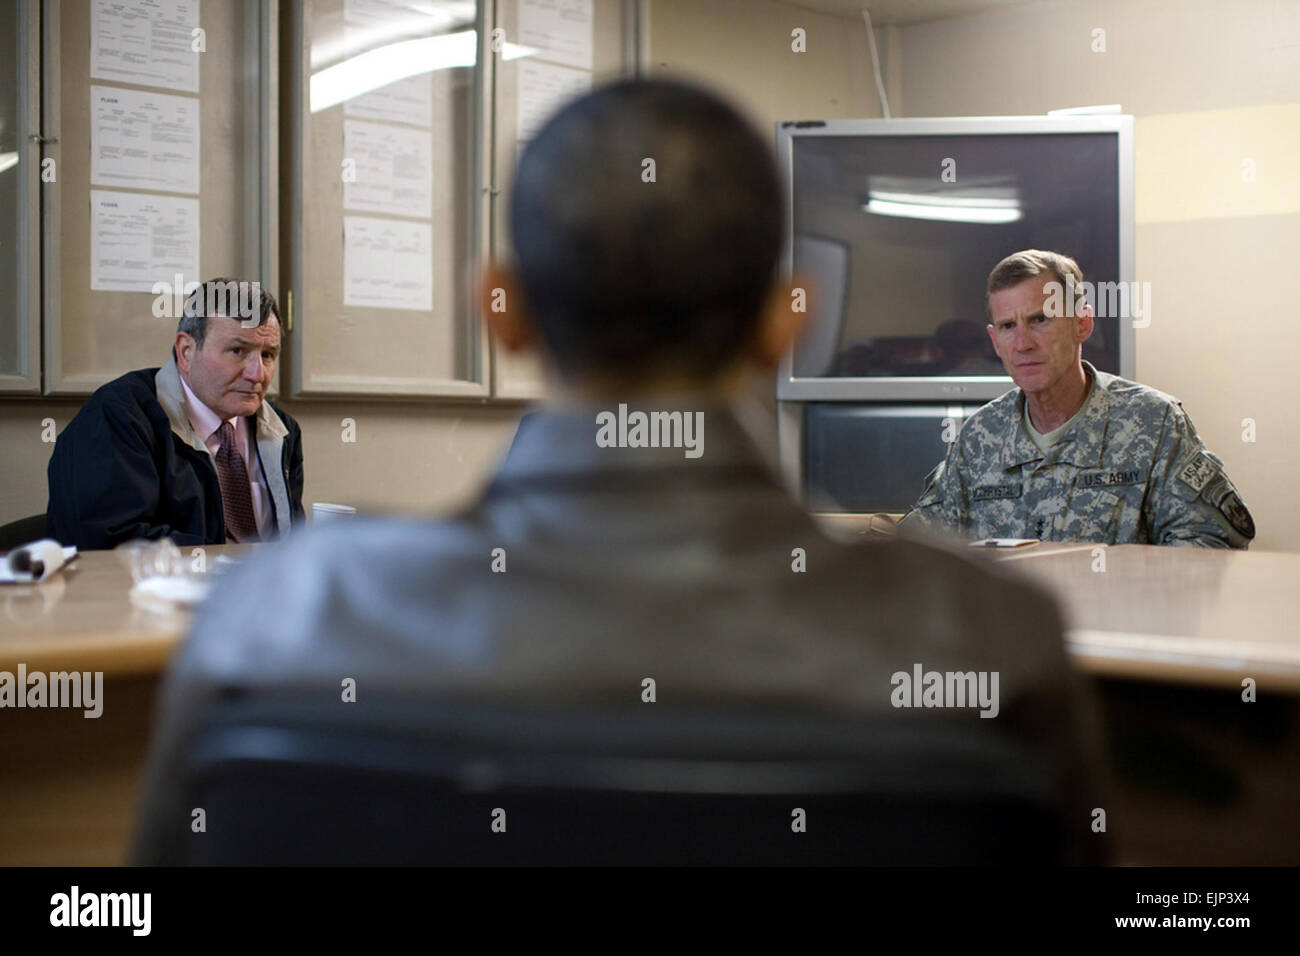 U.S. President Barack Obama meets with U.S. Ambassador to Afghanistan Karl Eikenberry, left, and Army Gen. Stanley - Stock Image